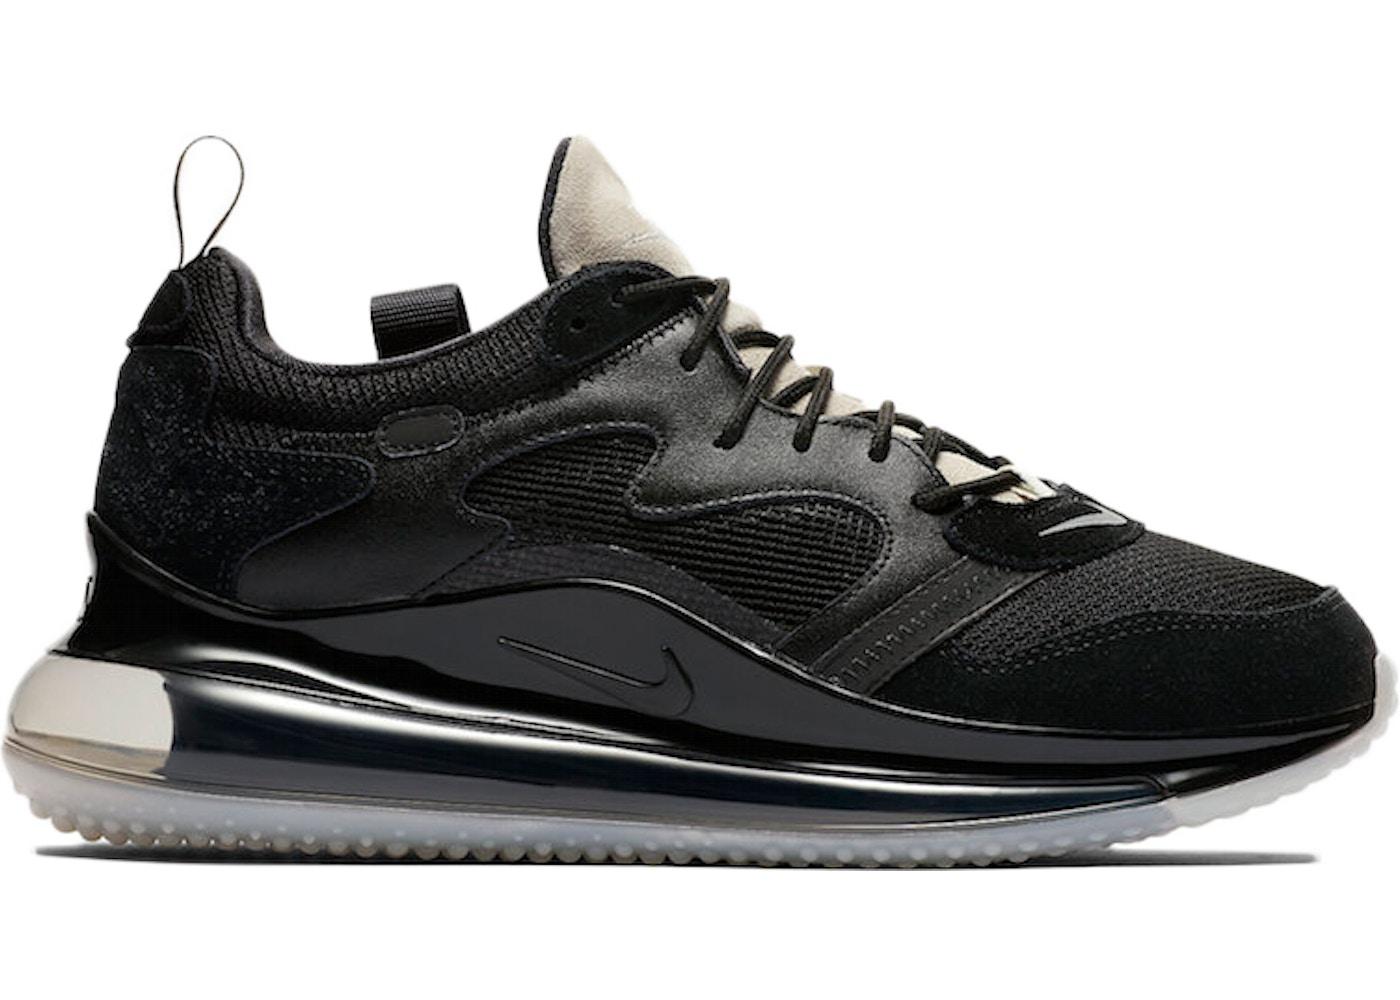 Nike Air Max 720 Obj Odell Beckham Jr Black Ck2531 002